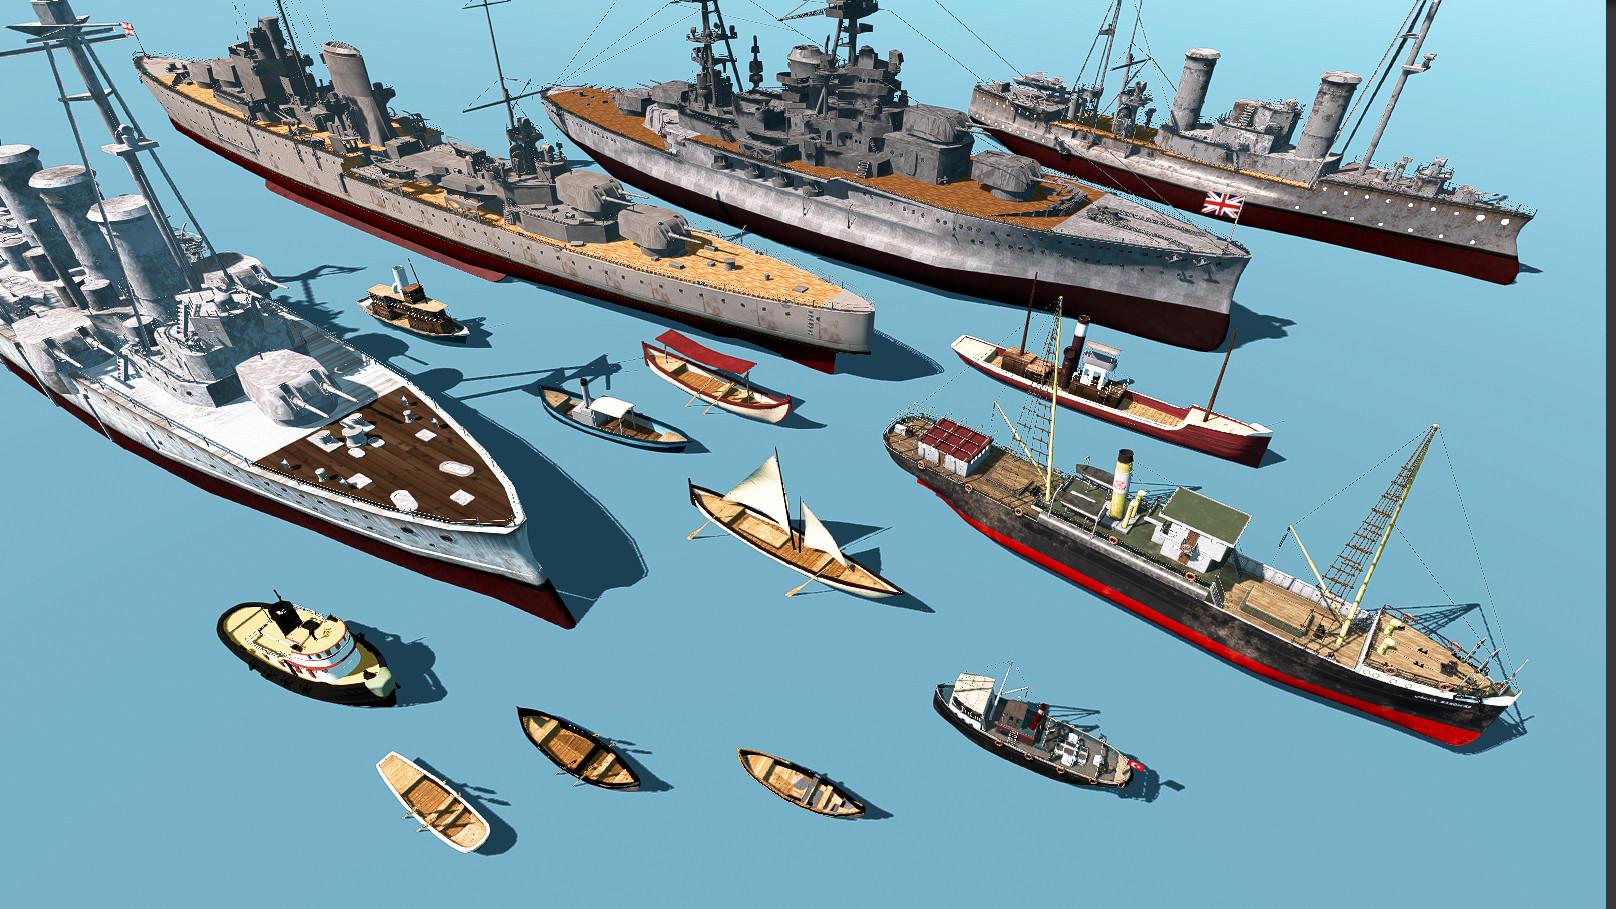 Sea Vehicles in 1919's Bosphorus, Istanbul. SS Bandırma, Kartal Steamboat, Civil transport ships, fisher boats & allied battleships ( HMS Ramillies, HMS Ajax, U.S.S Cassini, Gergios Averof ( Θ/Κ Γεώργιος Αβέρωφ ) )